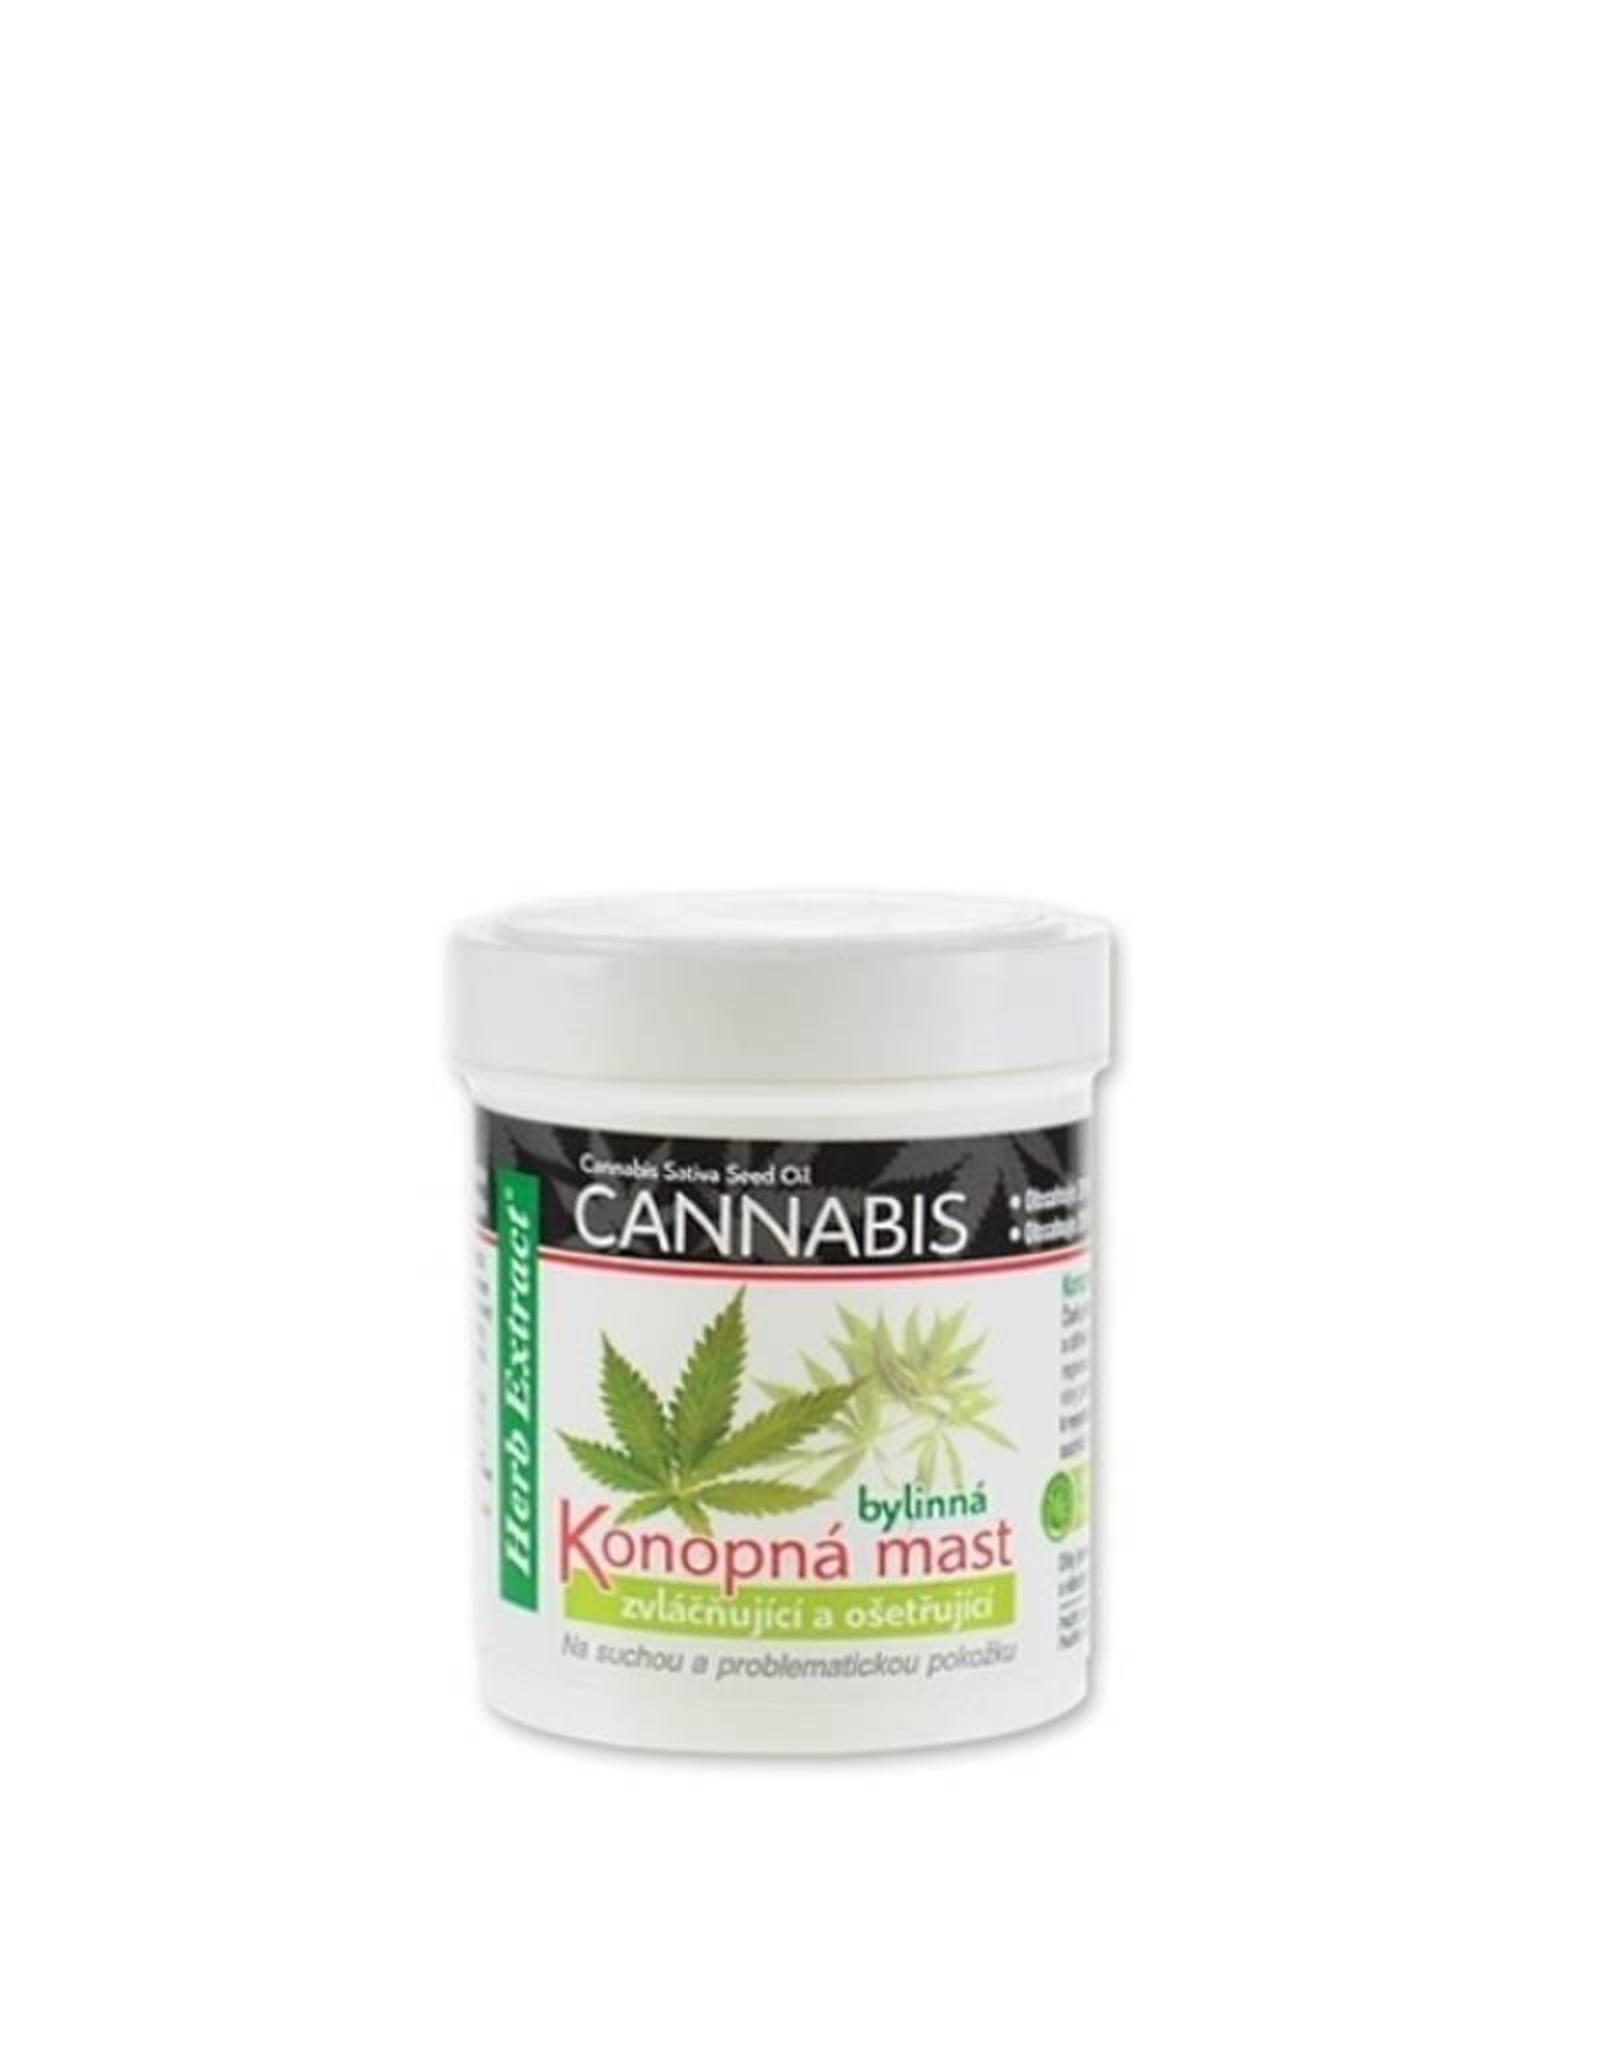 Herb Extract® Kalmerend en Verzorgend Kruidenbalsem met Cannabis Olie